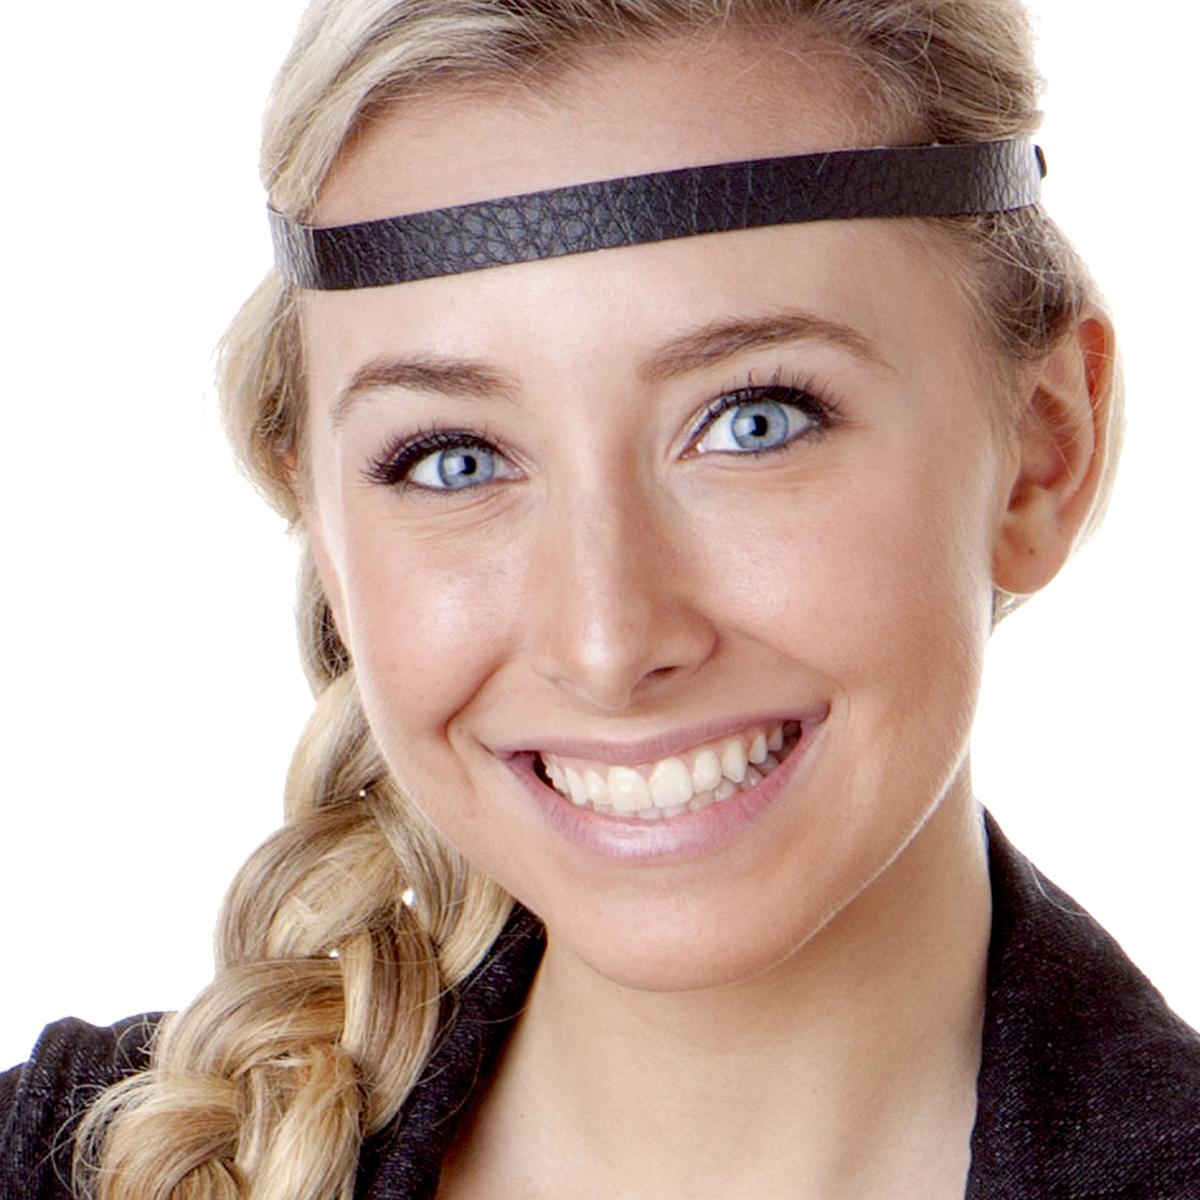 Skinny faux leather headbands